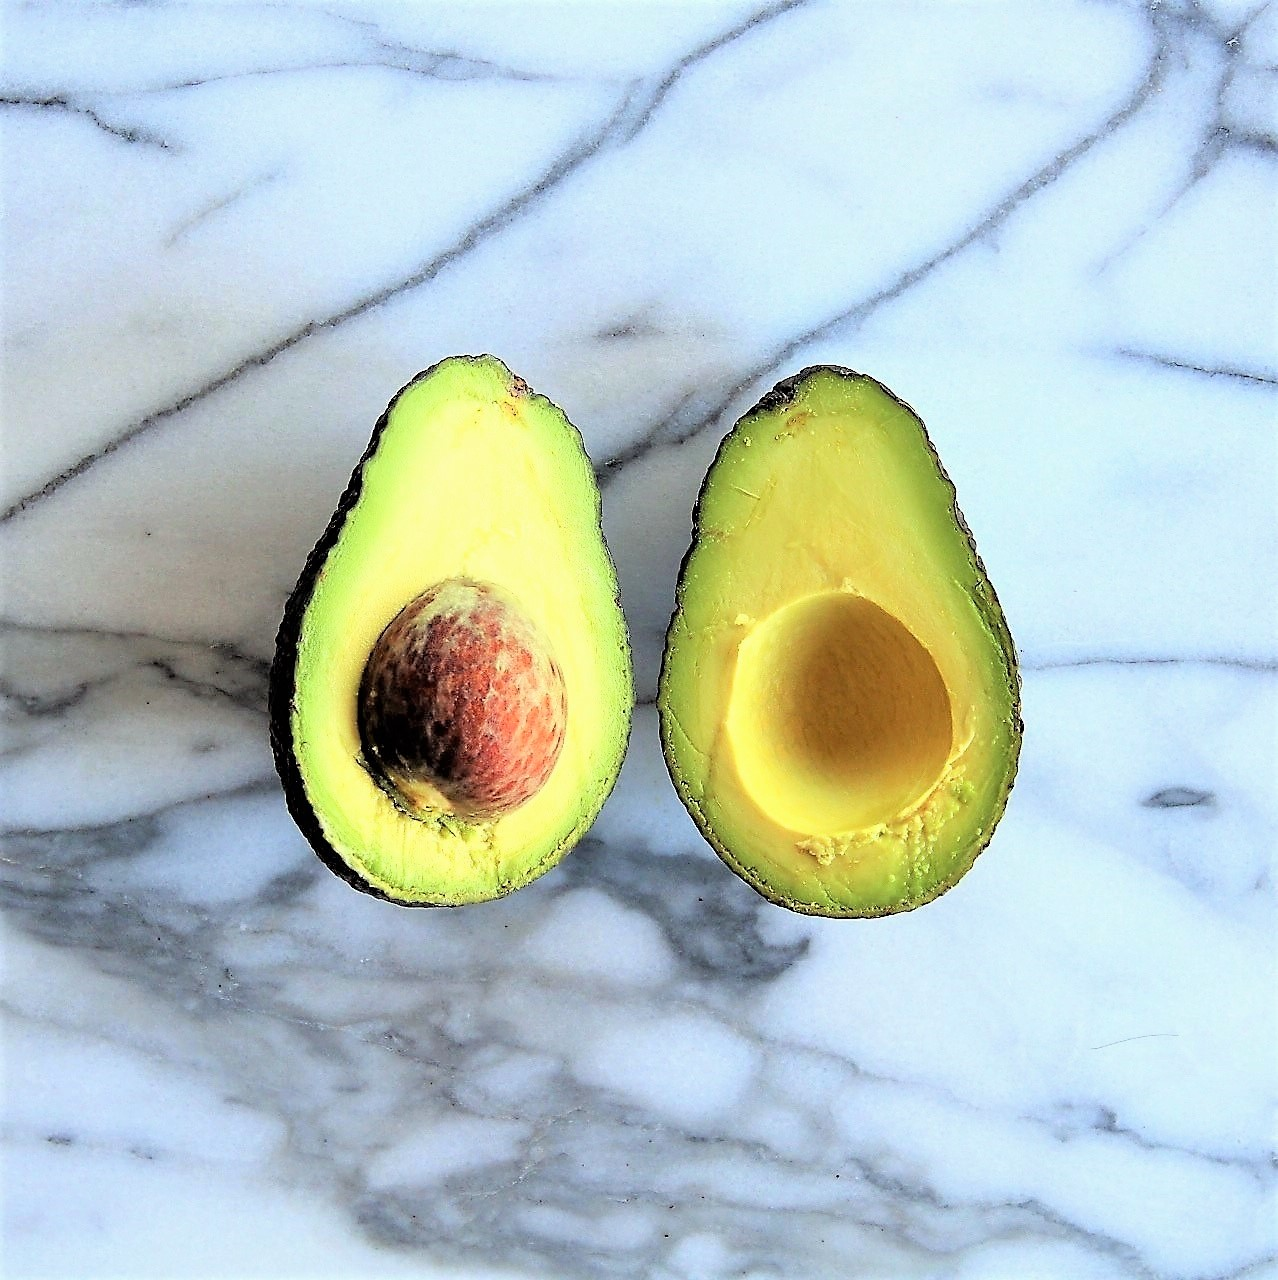 Slice the avocado in half lengthwise